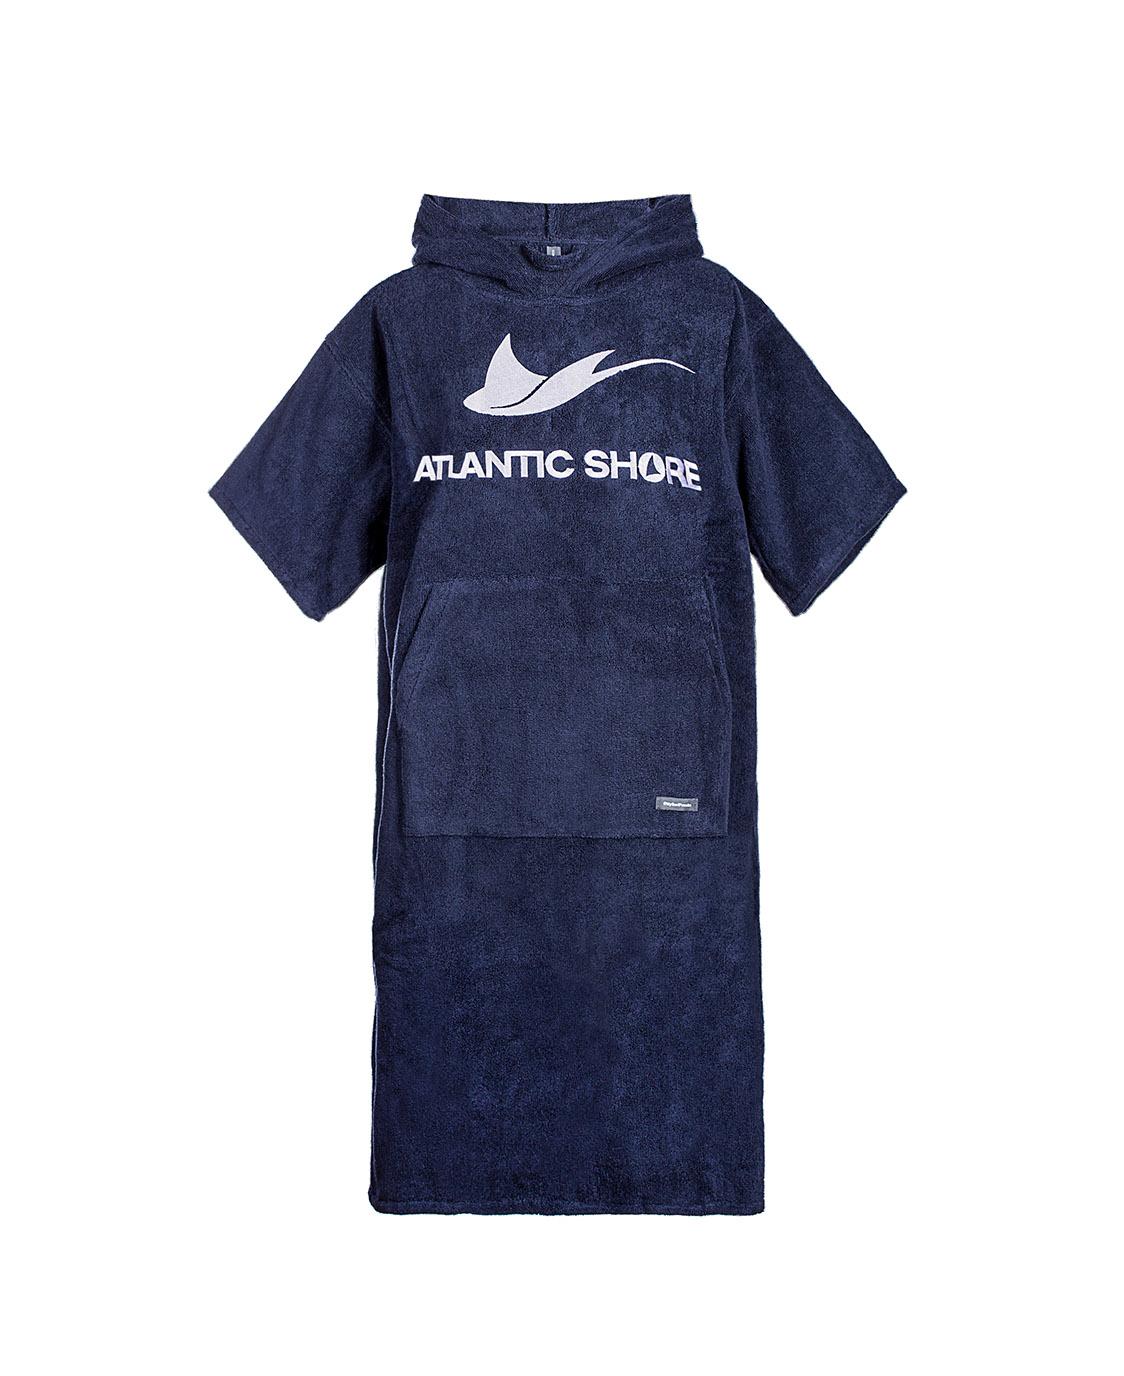 Atlantic Shore   Surf Poncho   Basic